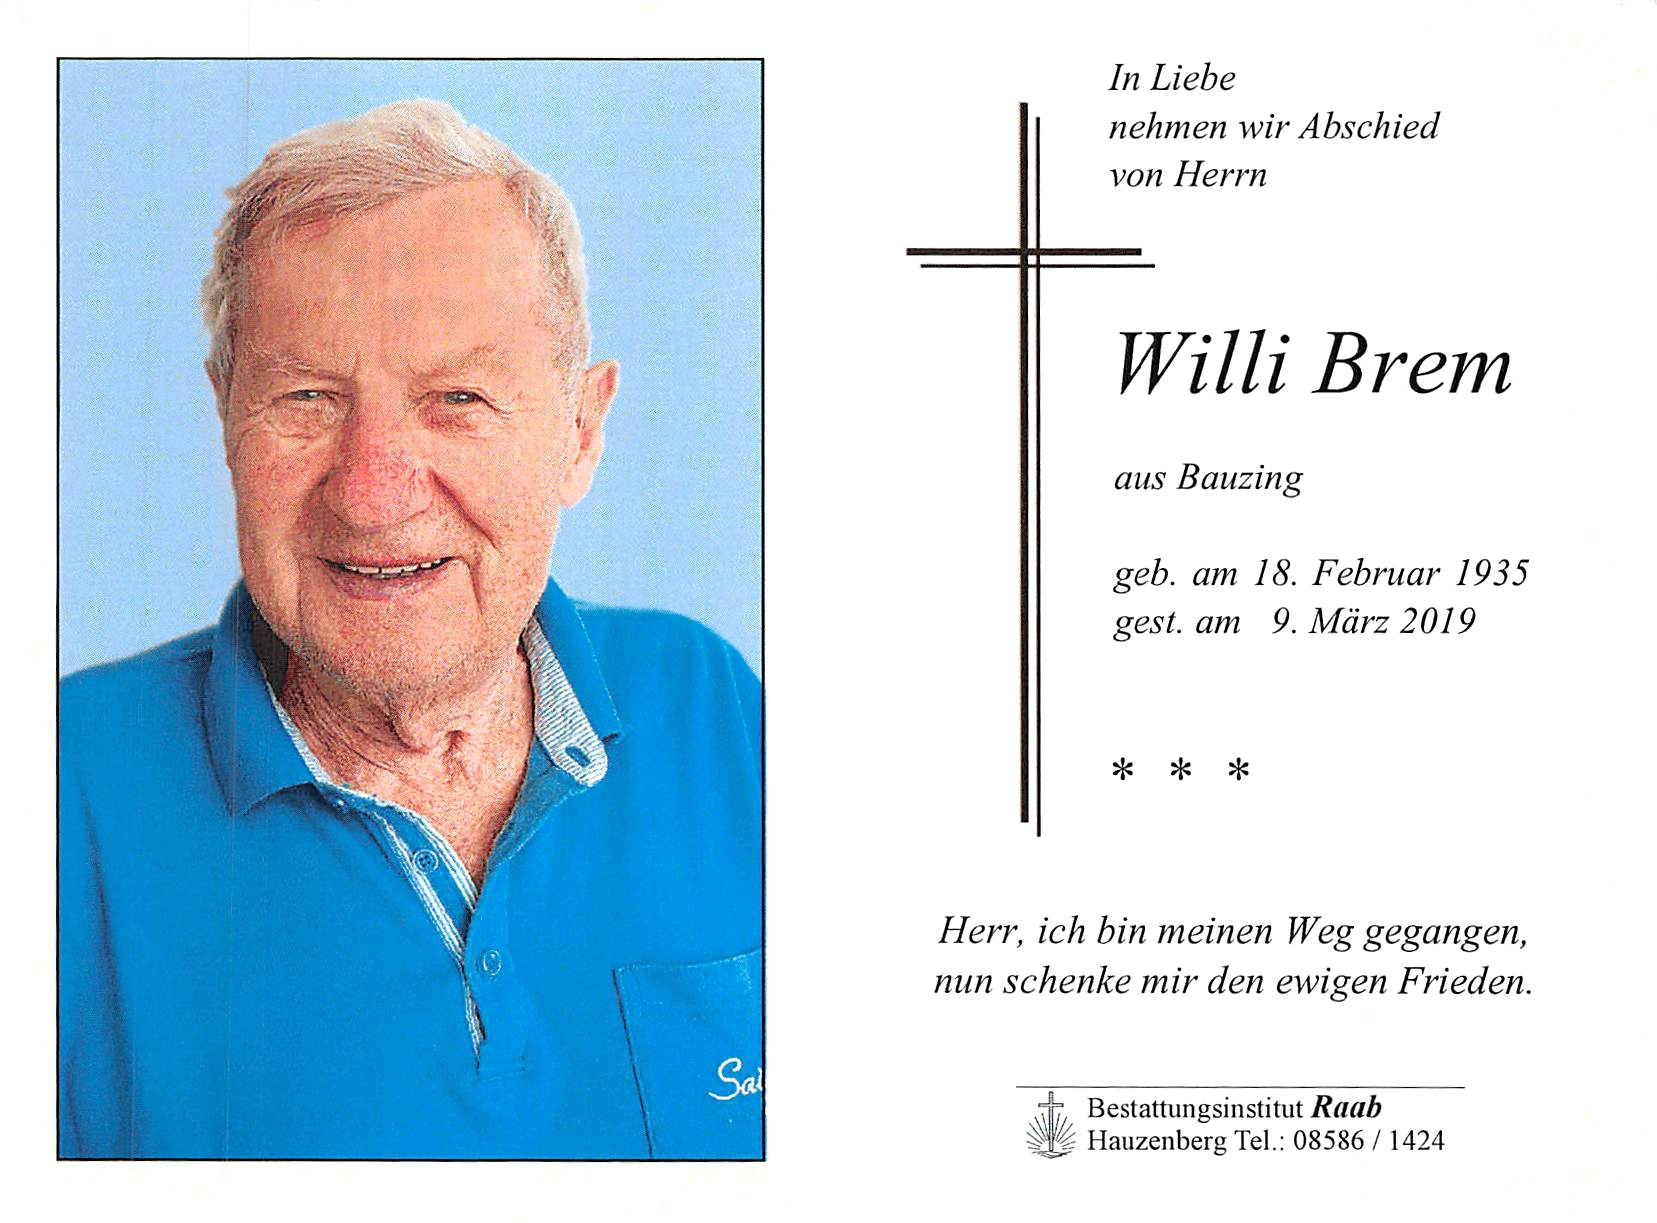 2019-03-09-Brem-Willi-Bauzing-Ehrenfahnenjunker-